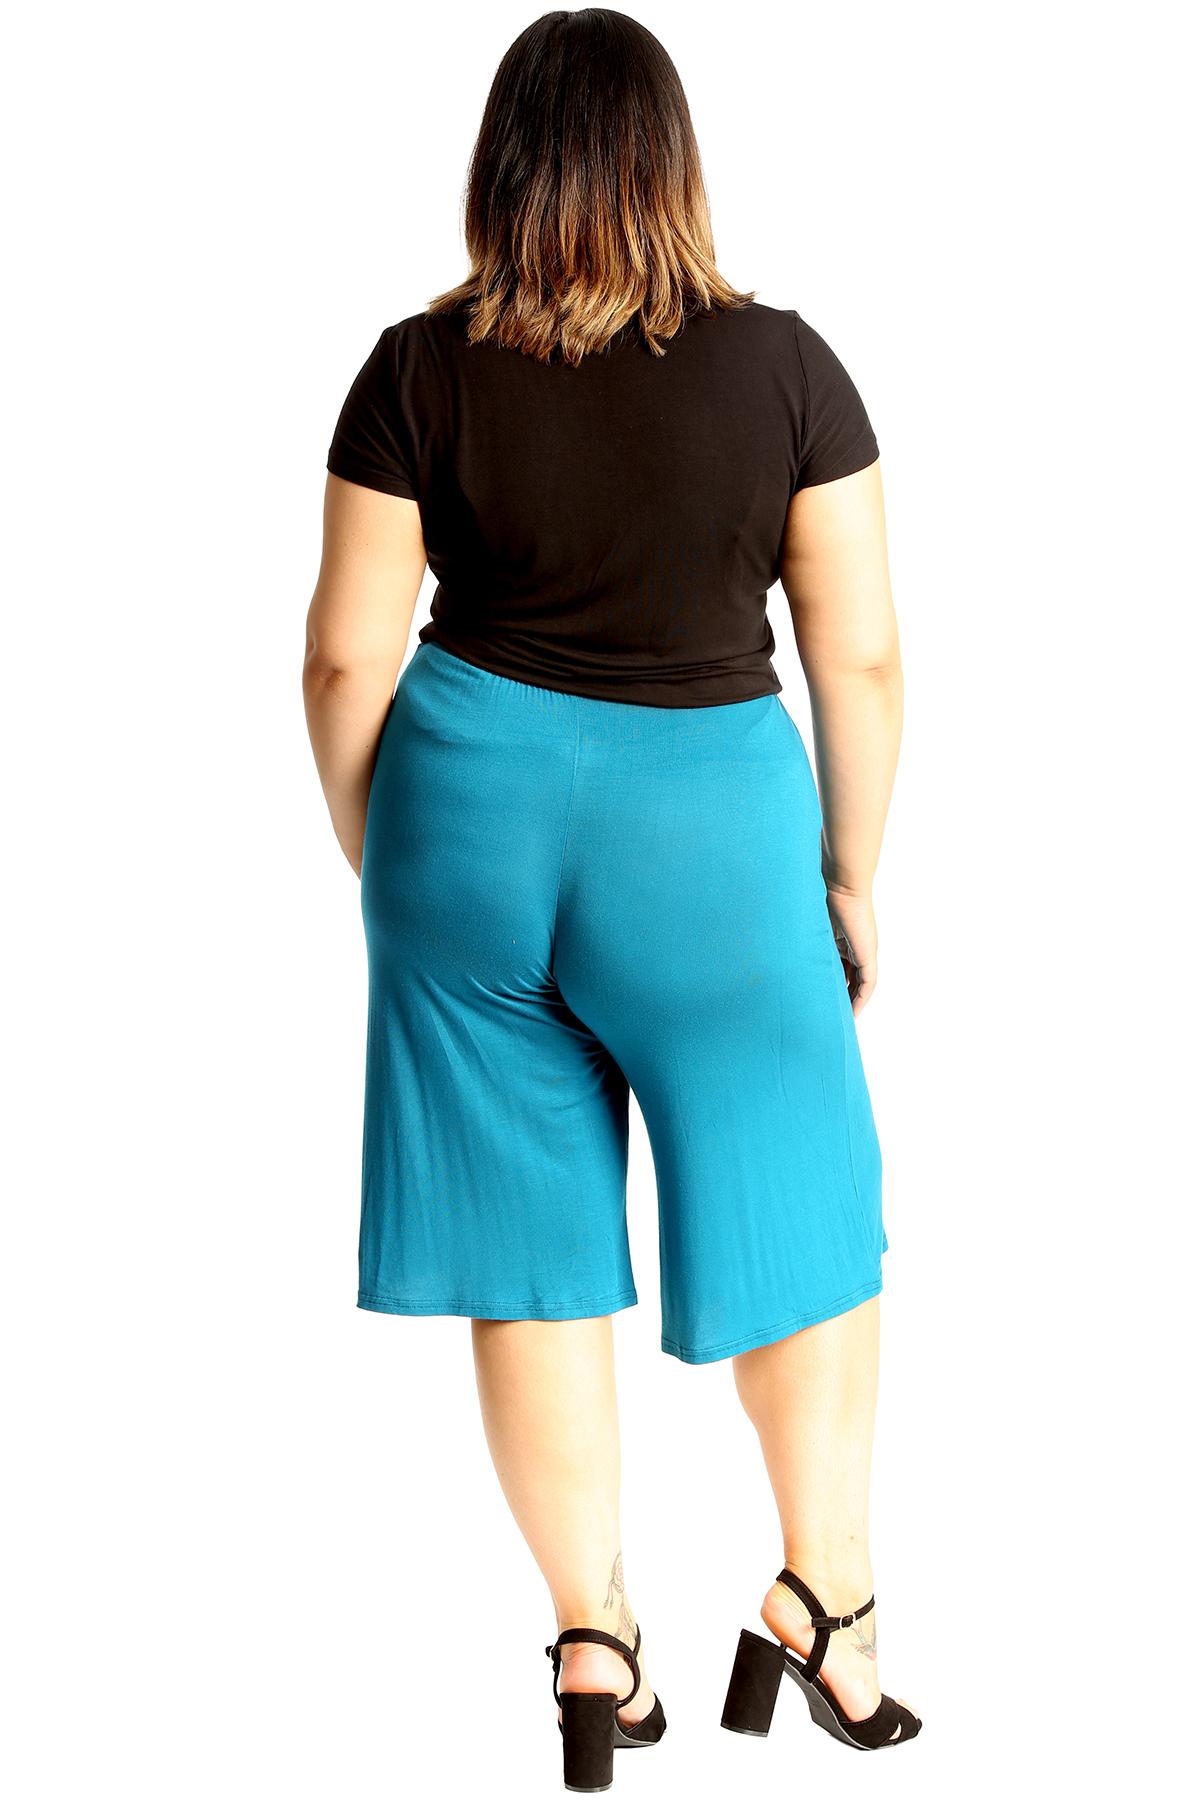 New-Womens-Plus-Size-Culottes-Ladies-Plain-Shorts-Palazzo-Elastic-Pants-Summer thumbnail 40